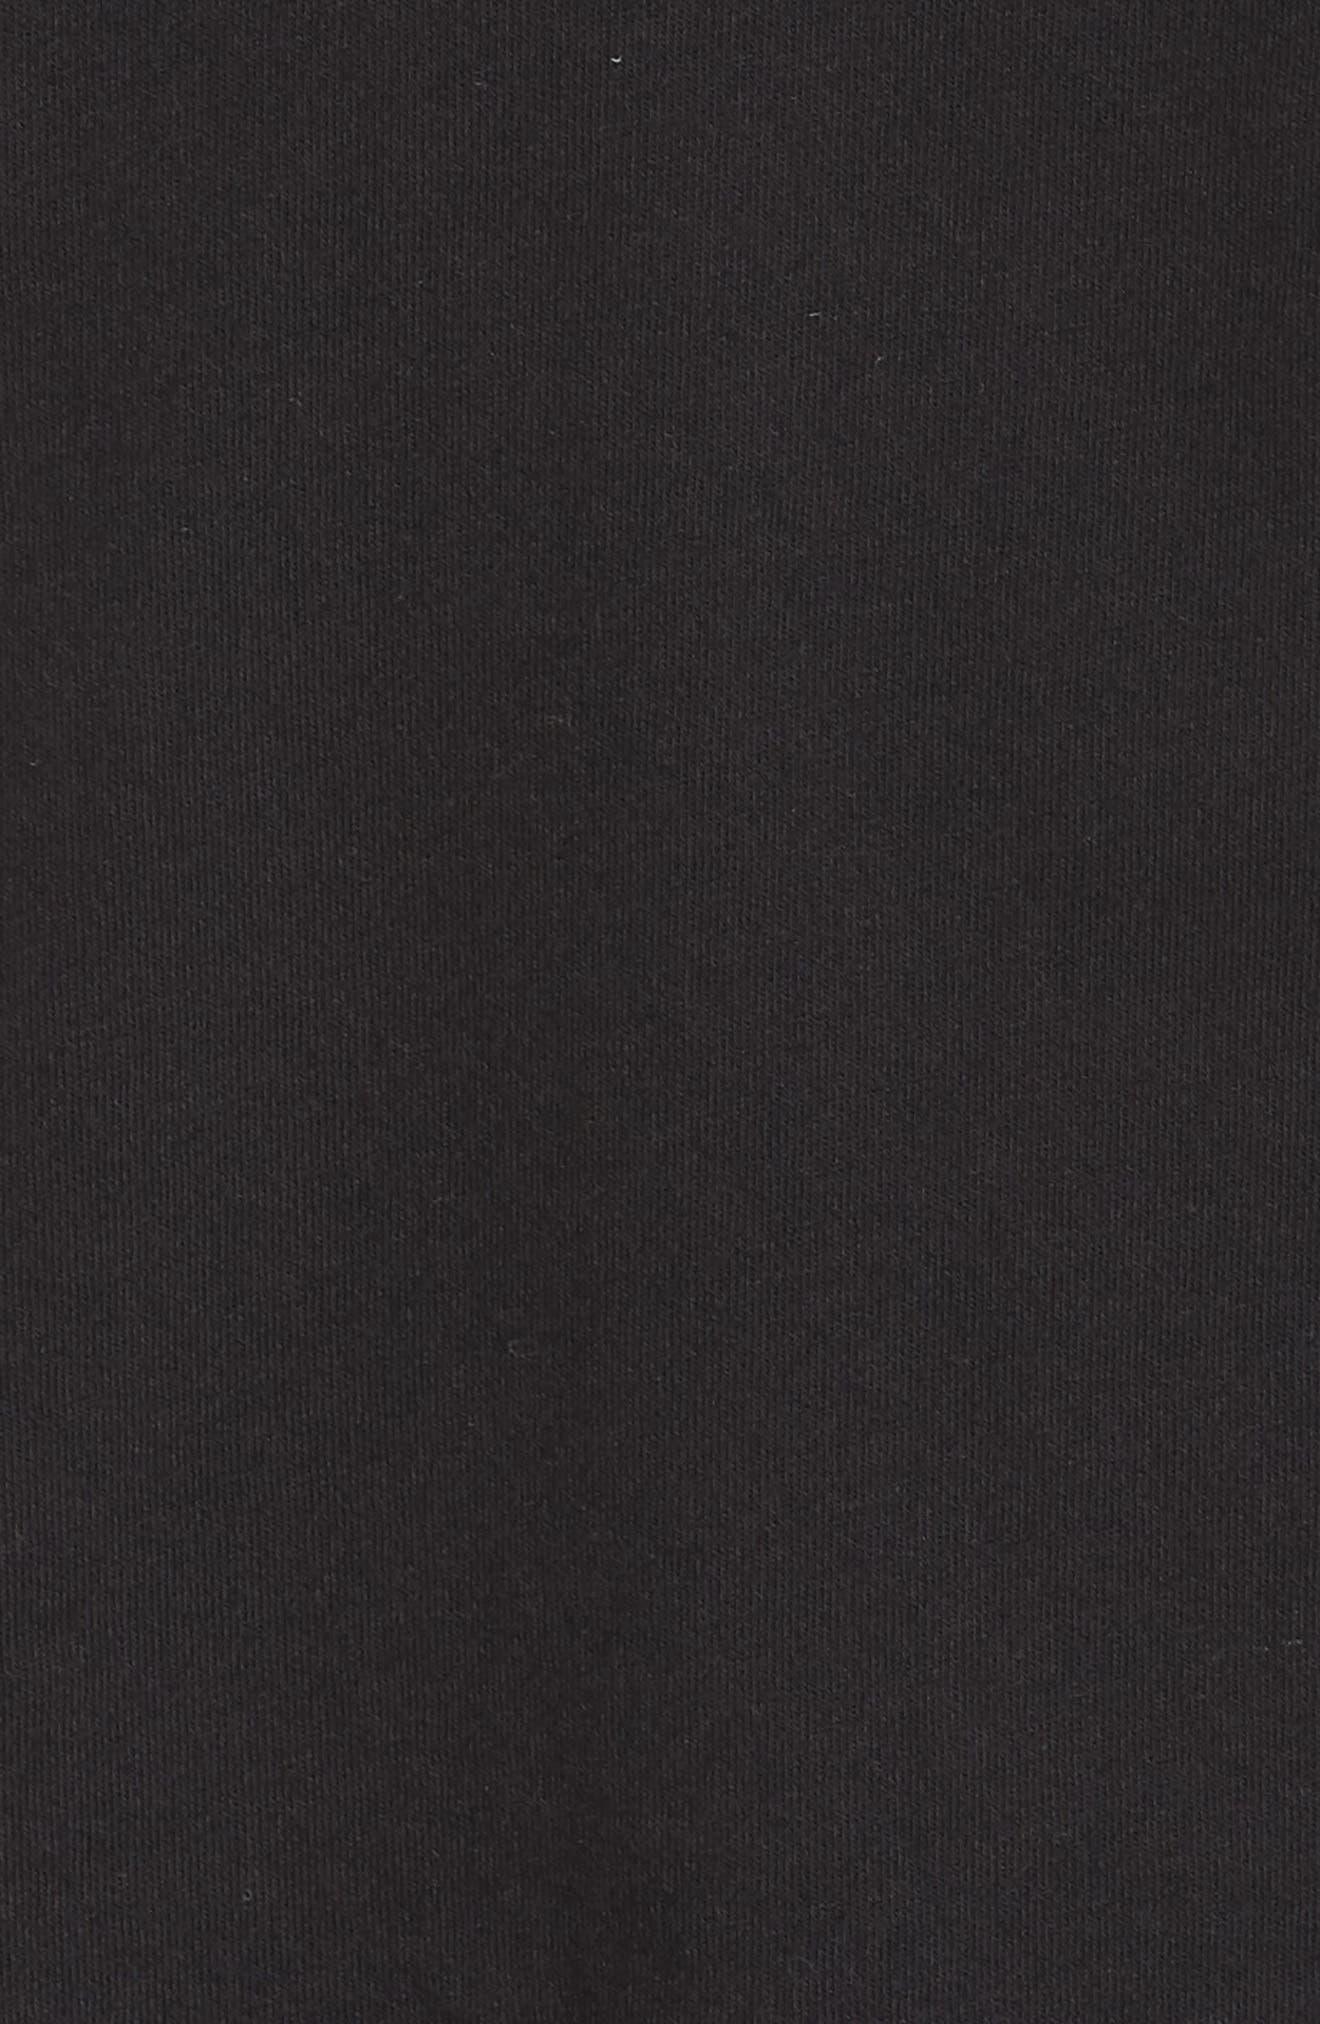 RICHER POORER, Boxy Crop Tee, Alternate thumbnail 5, color, BLACK